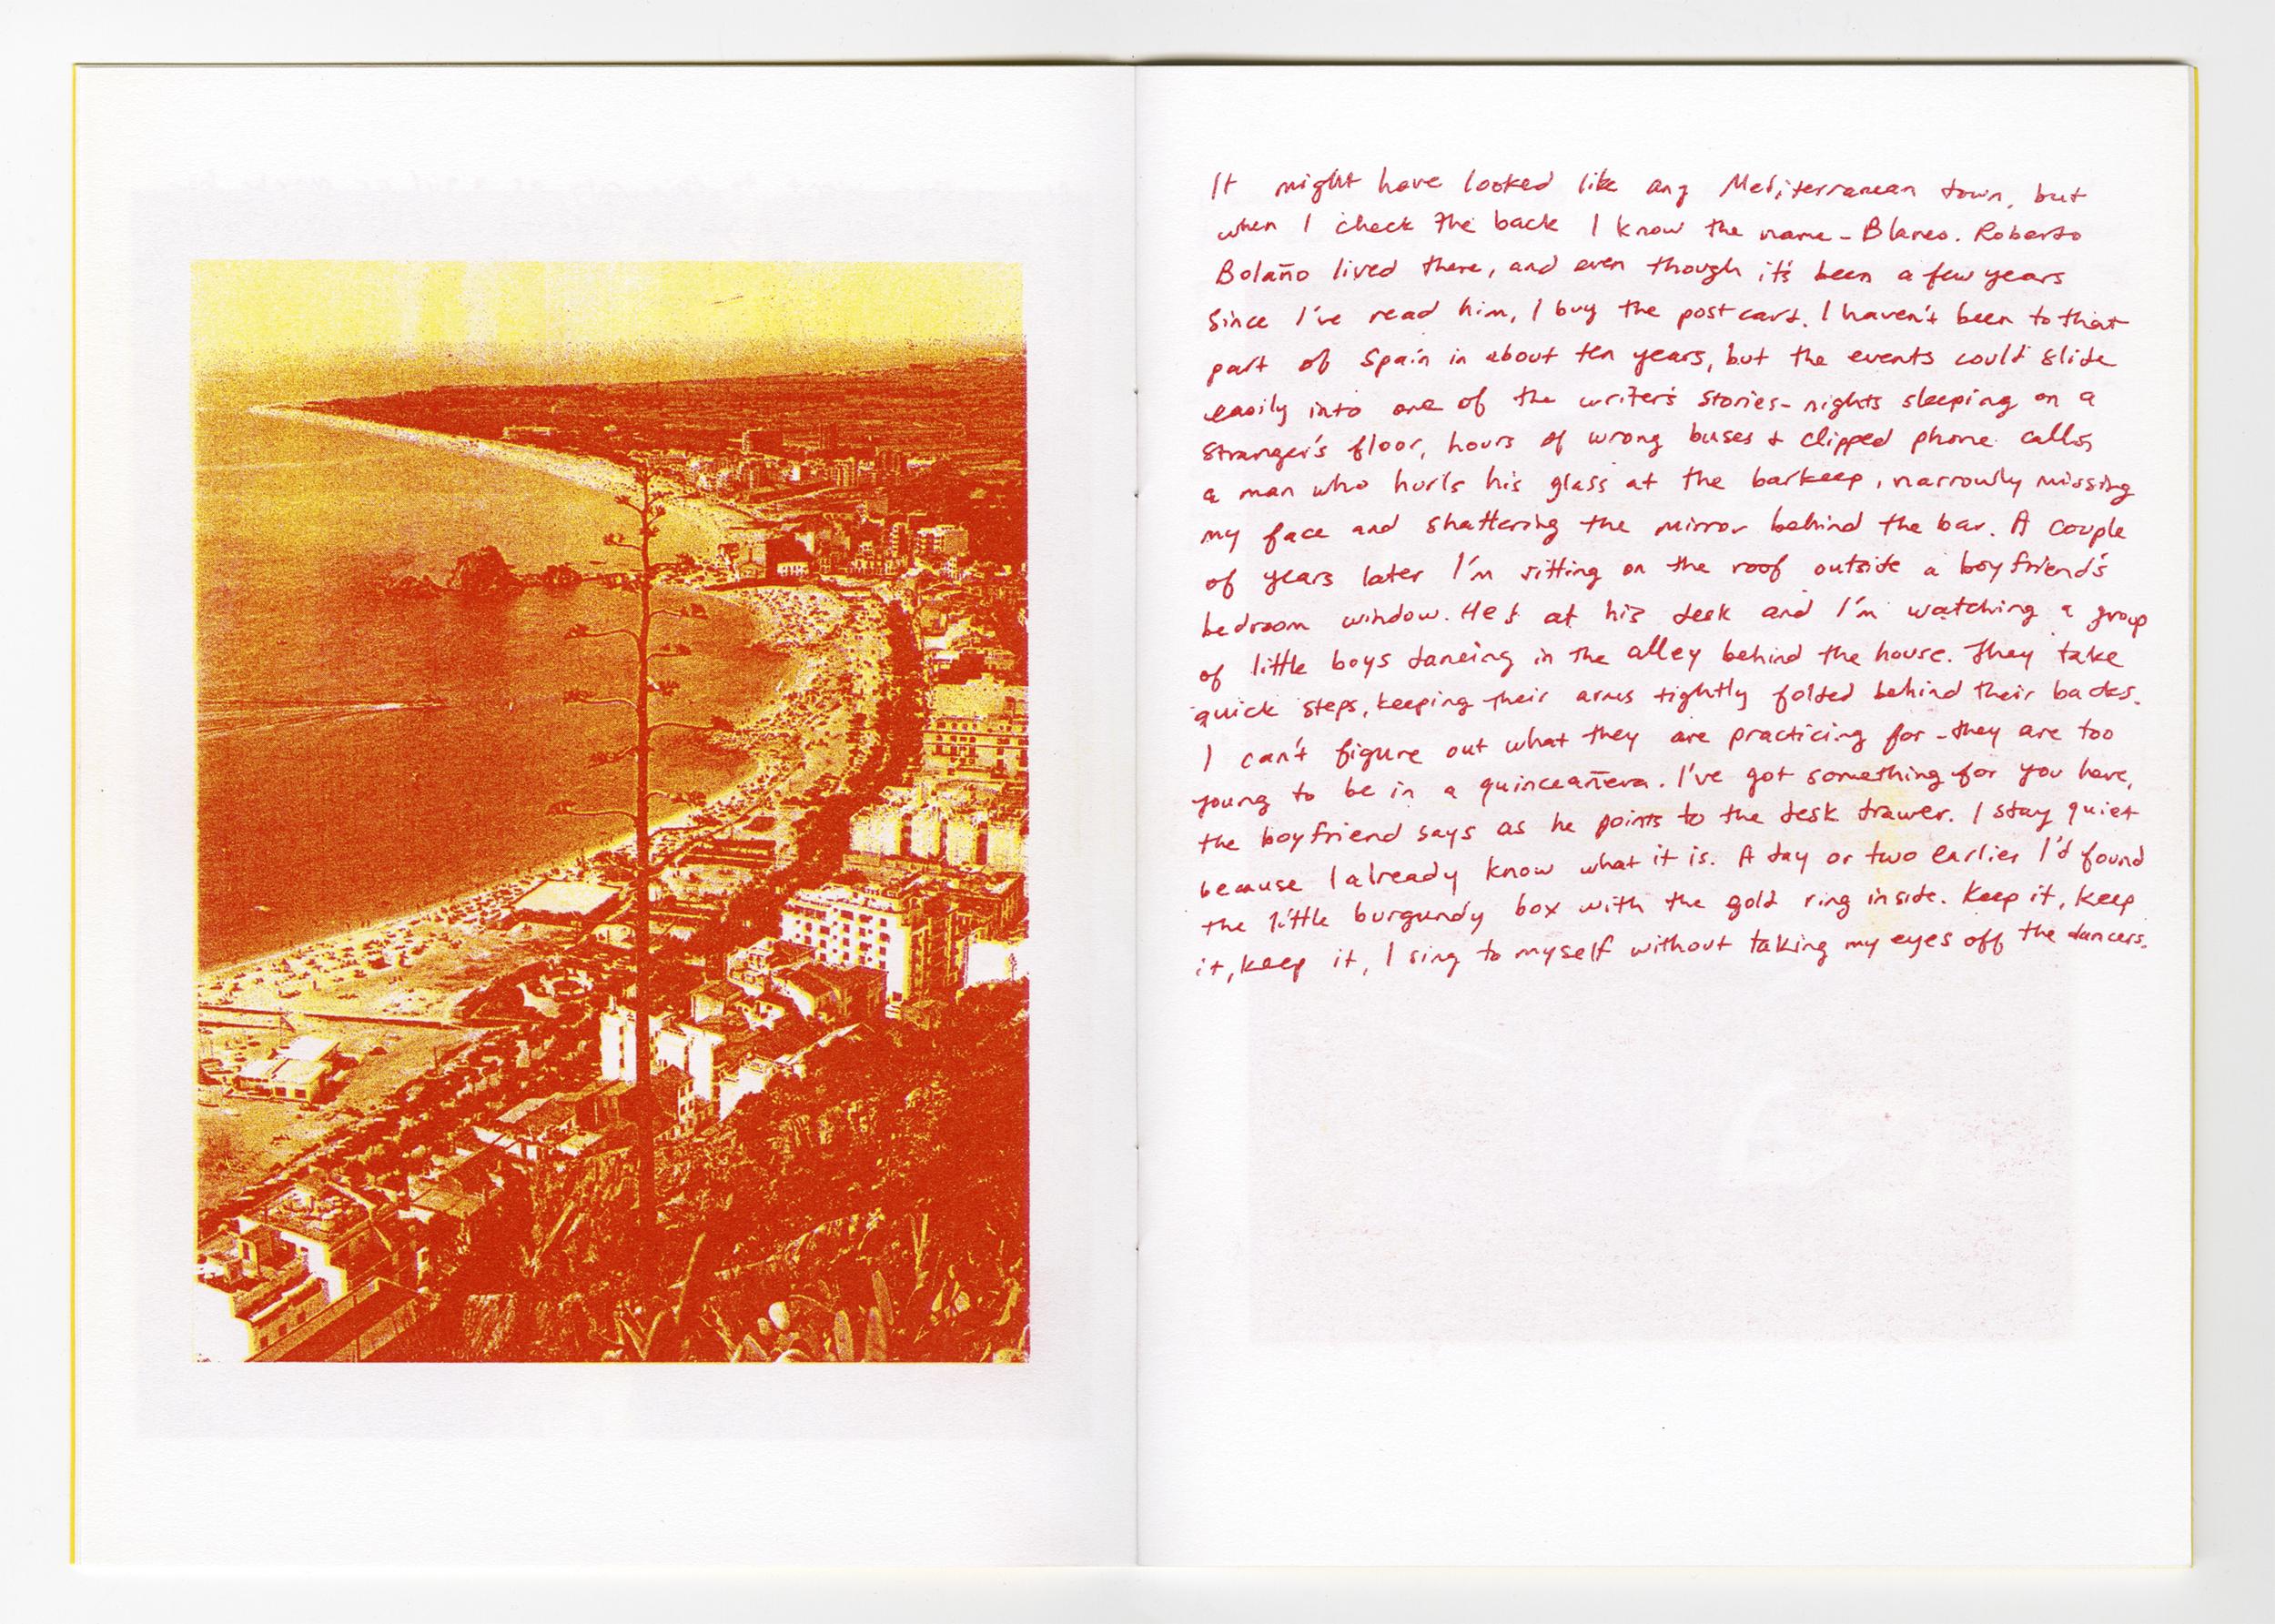 ninepostcards-open-eng.jpg